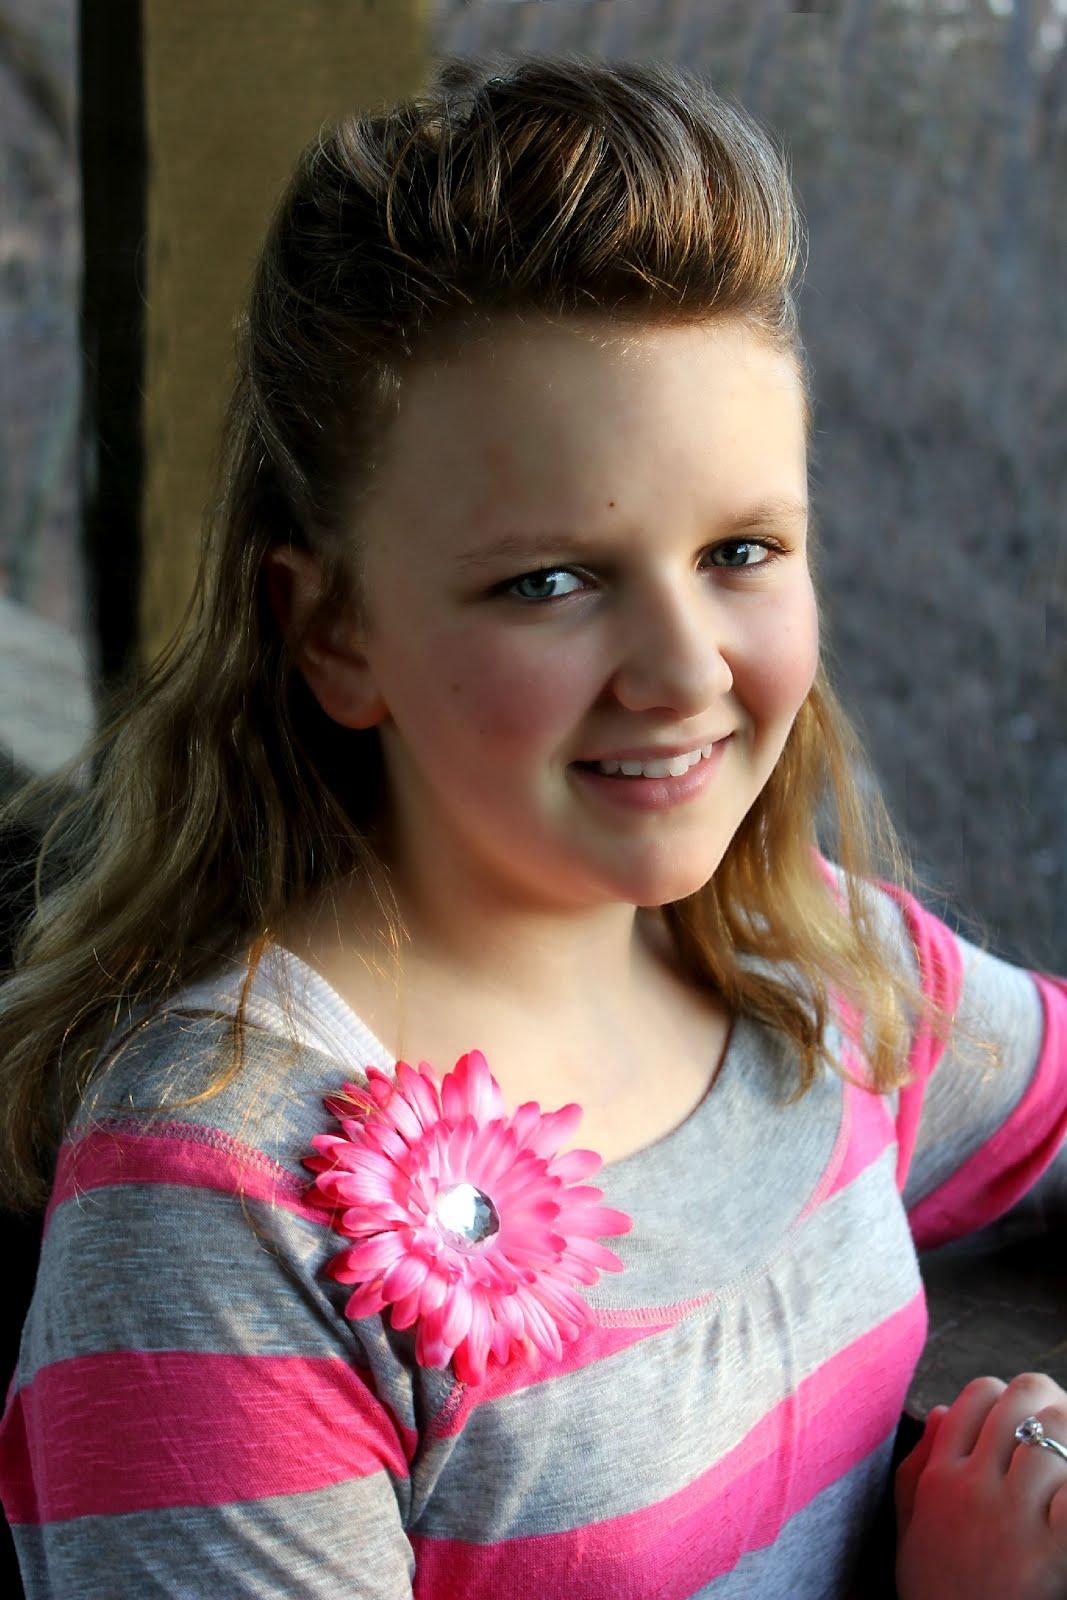 POSE child modeling mag Junior Fashion Experts: April 2012